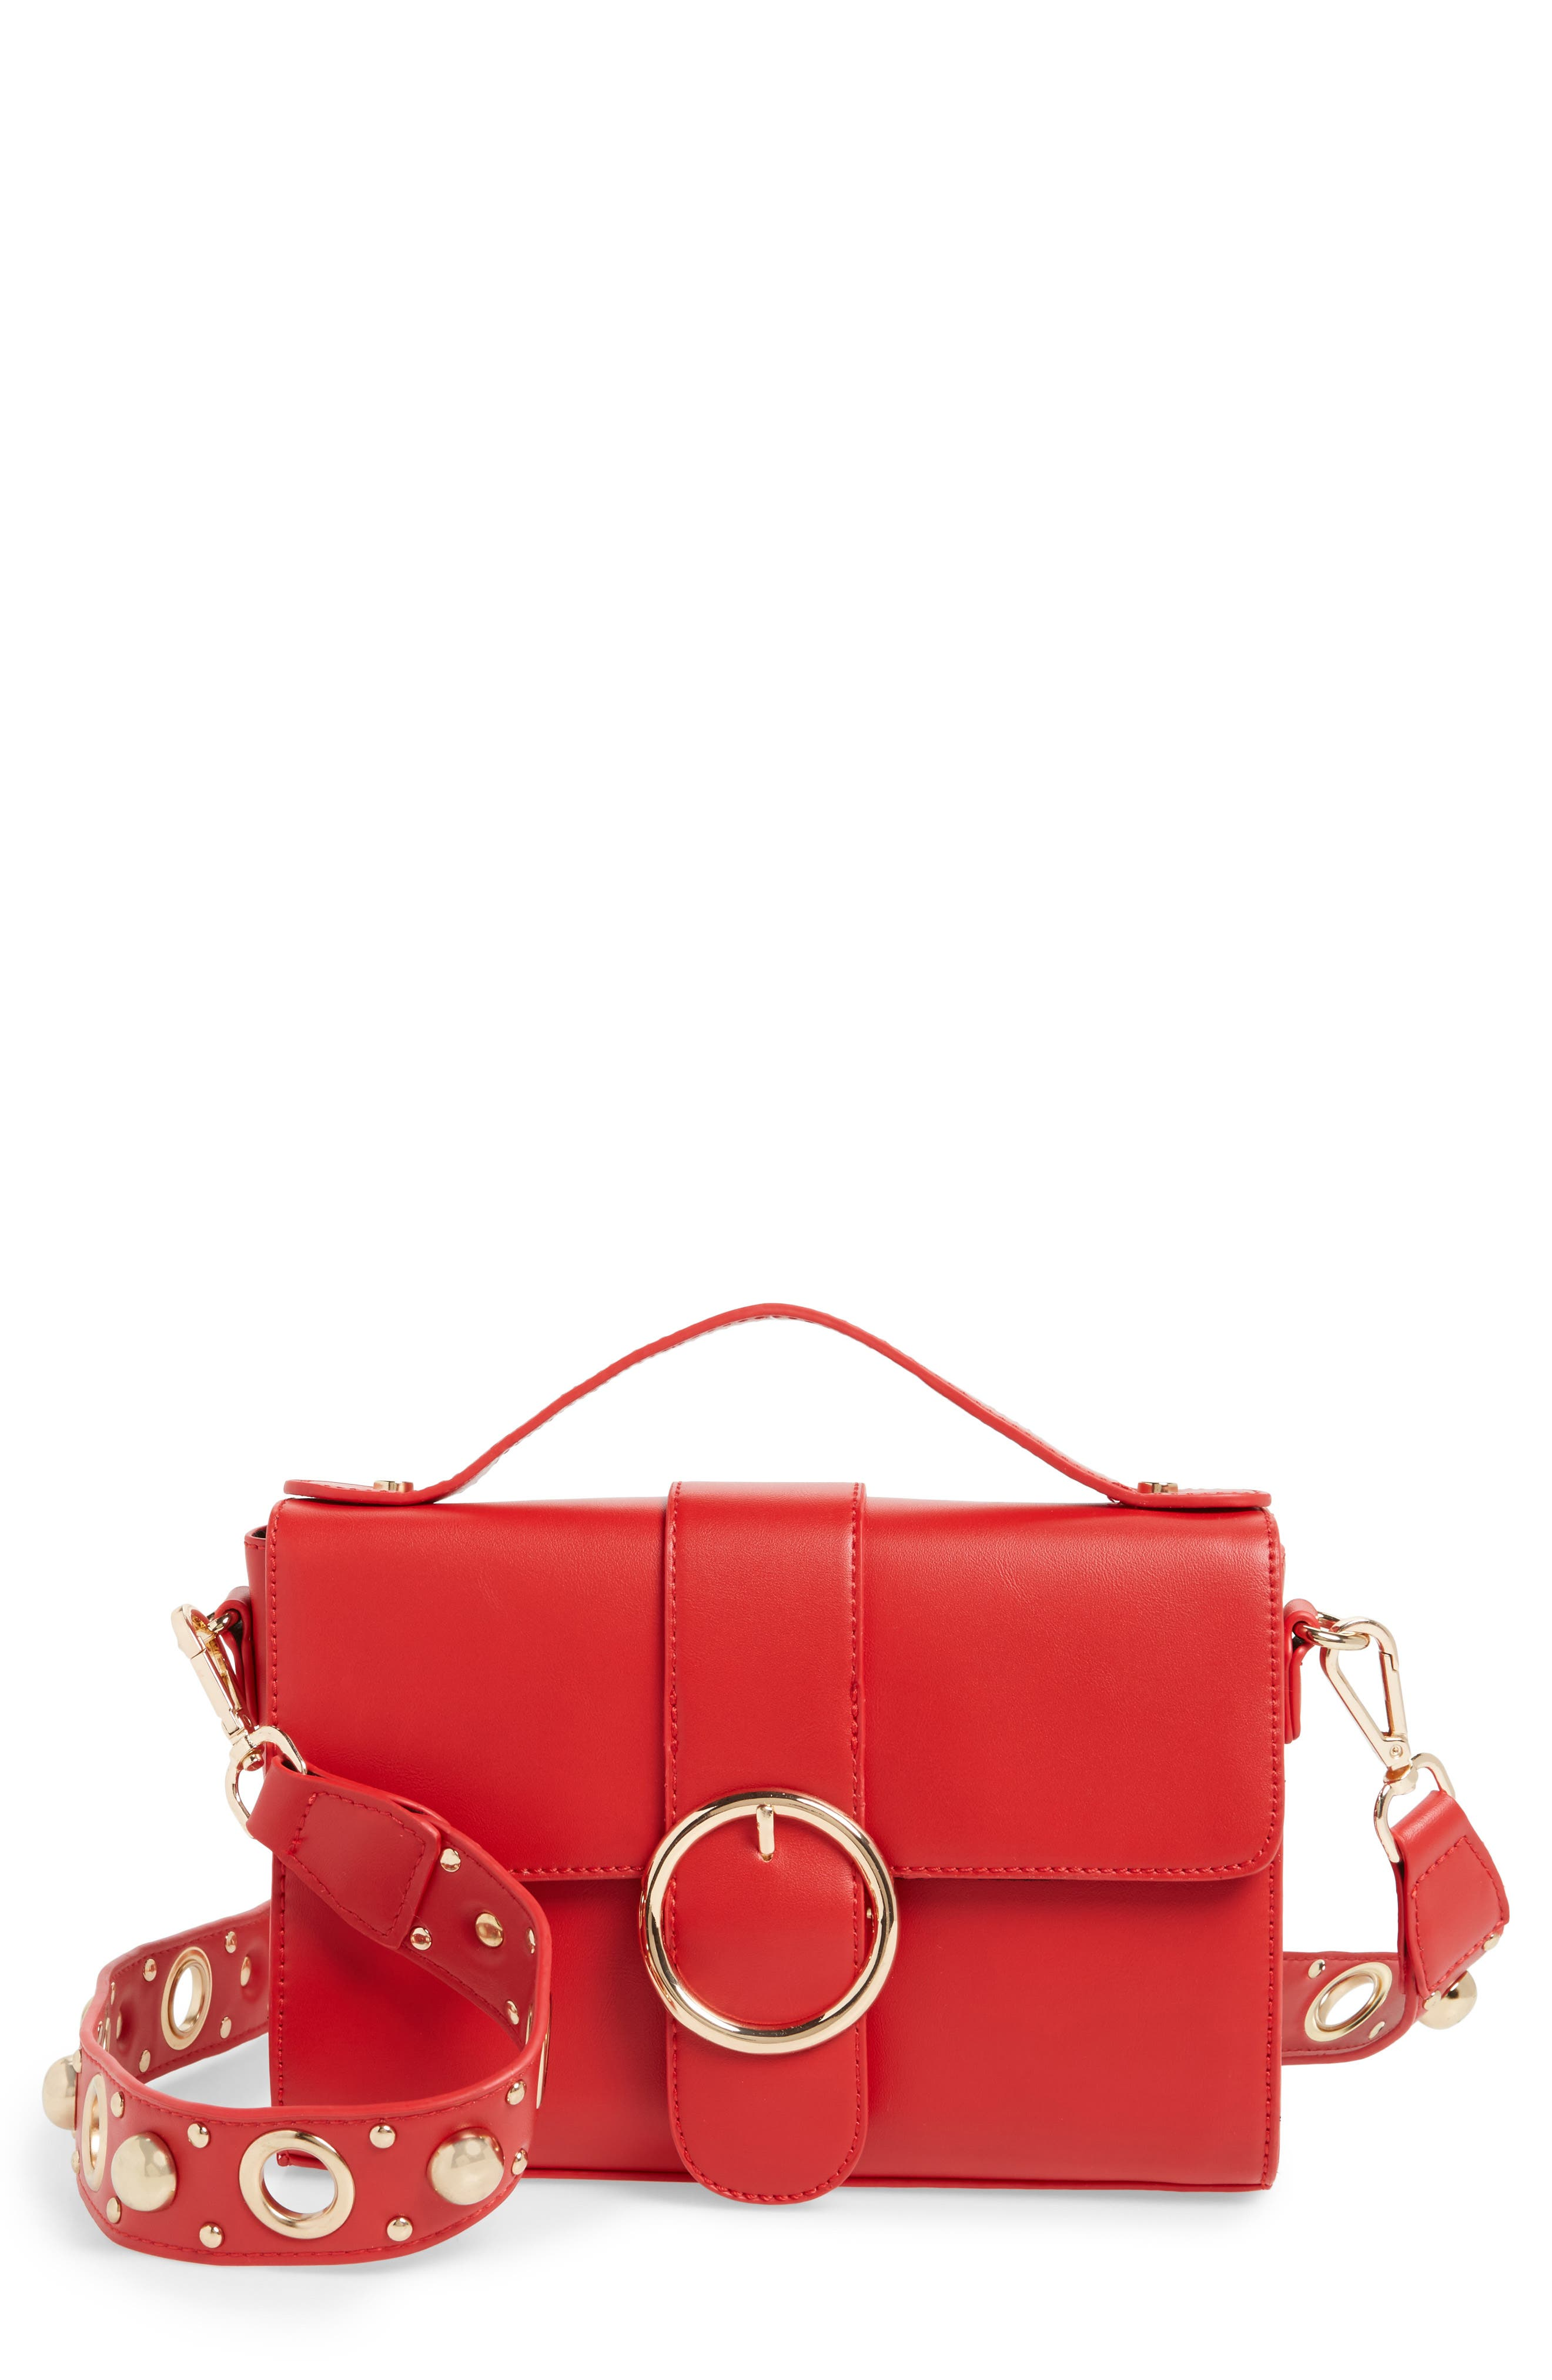 Alternate Image 1 Selected - Street Level Studded Strap Crossbody Bag